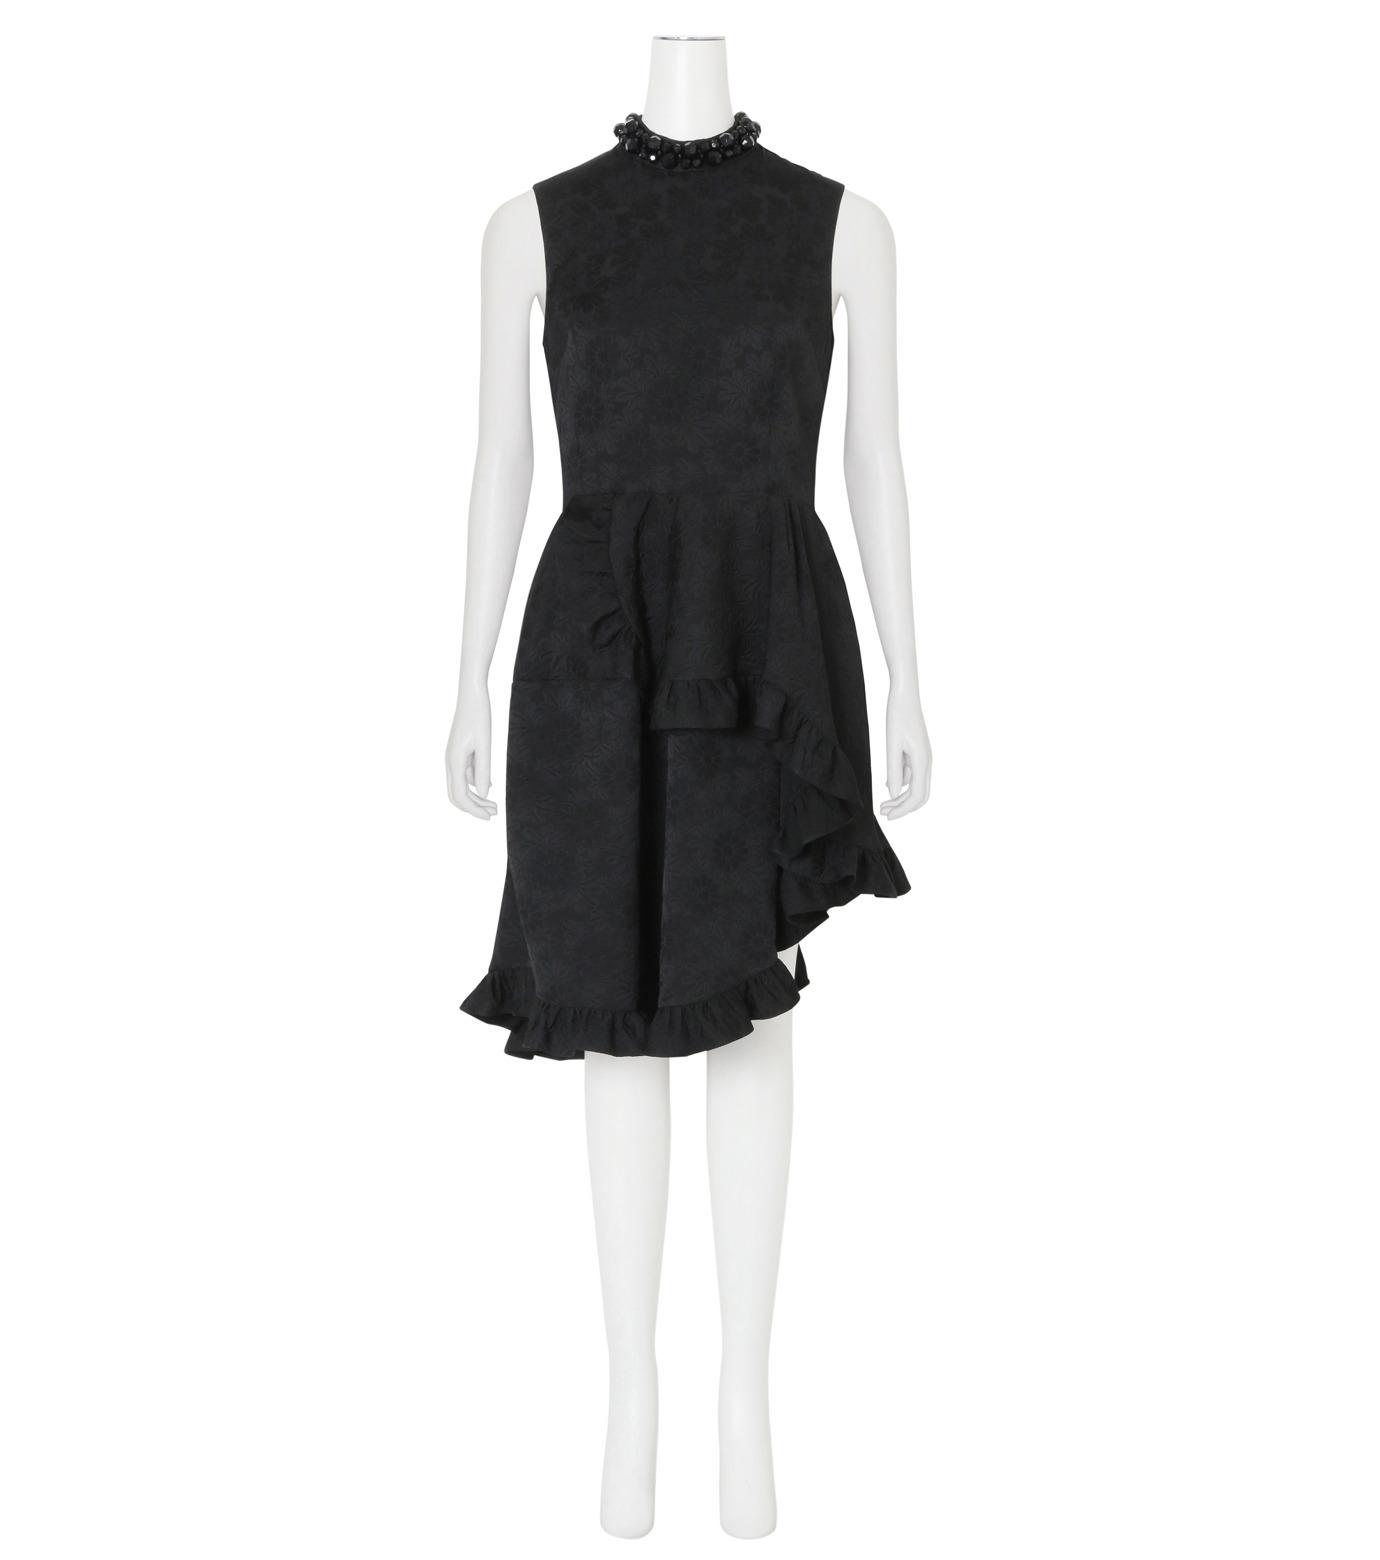 Simone Rocha(シモーネロシャ)のCotton Brocade Dress w/Beads-BLACK(ワンピース/one piece)-3749B-13 拡大詳細画像1